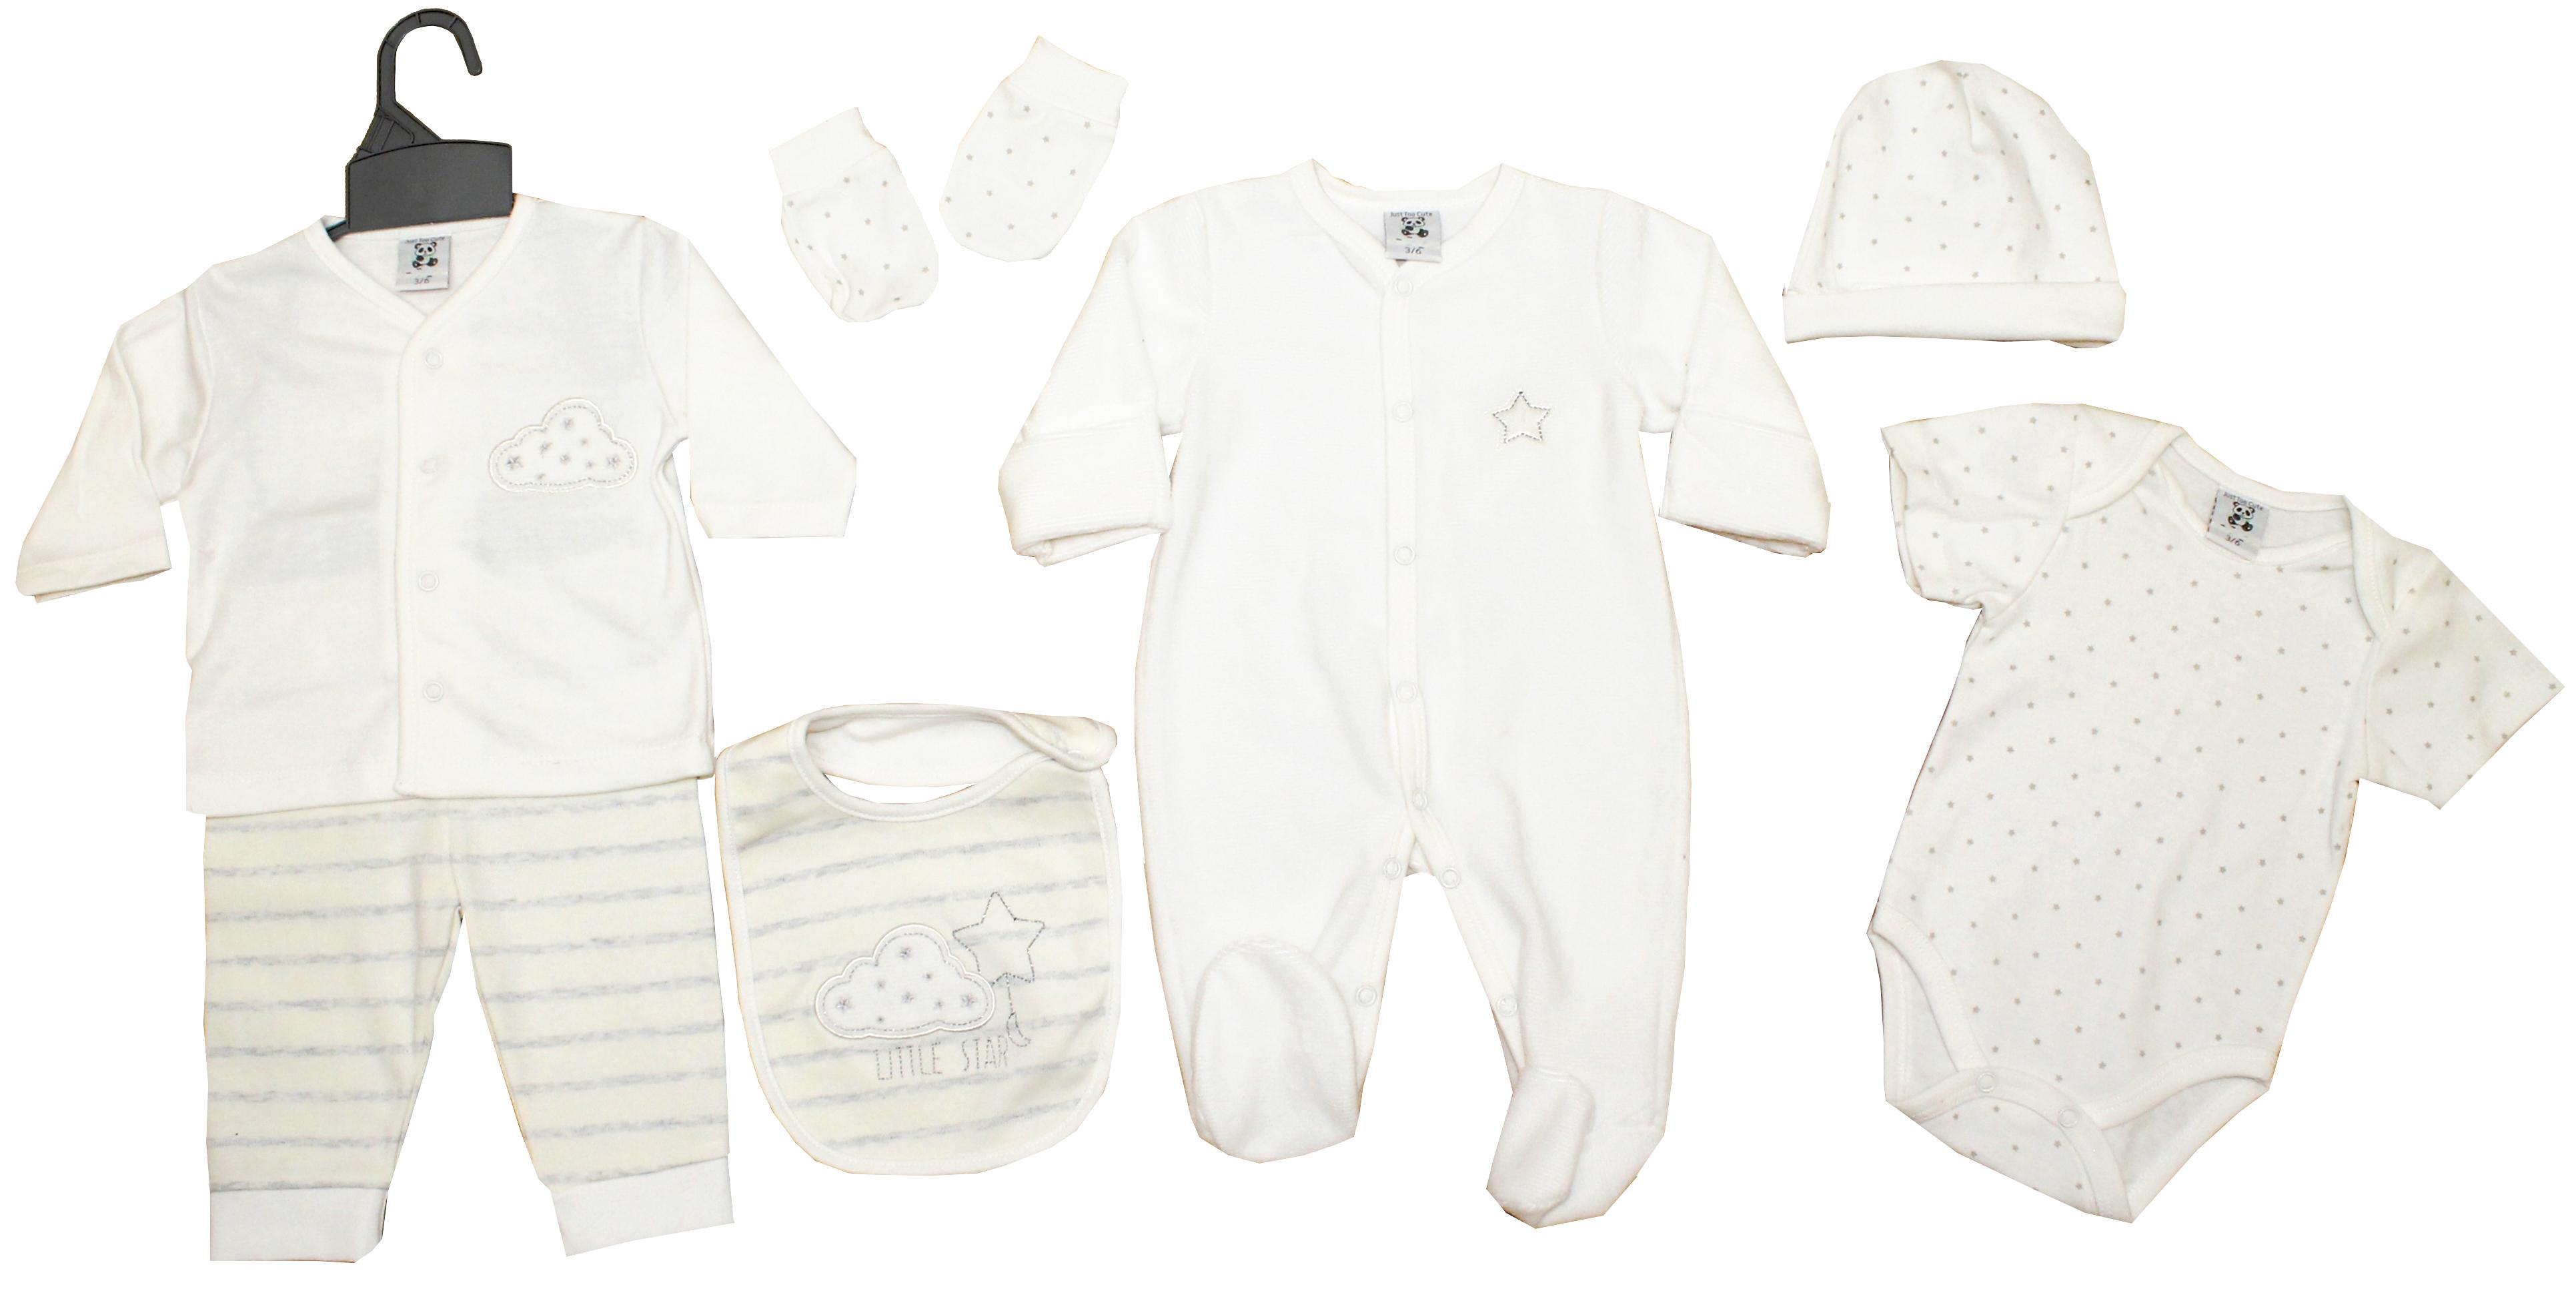 e202bbfac Baby's 7 Piece set-Little Star – 4 Direct Uniforms